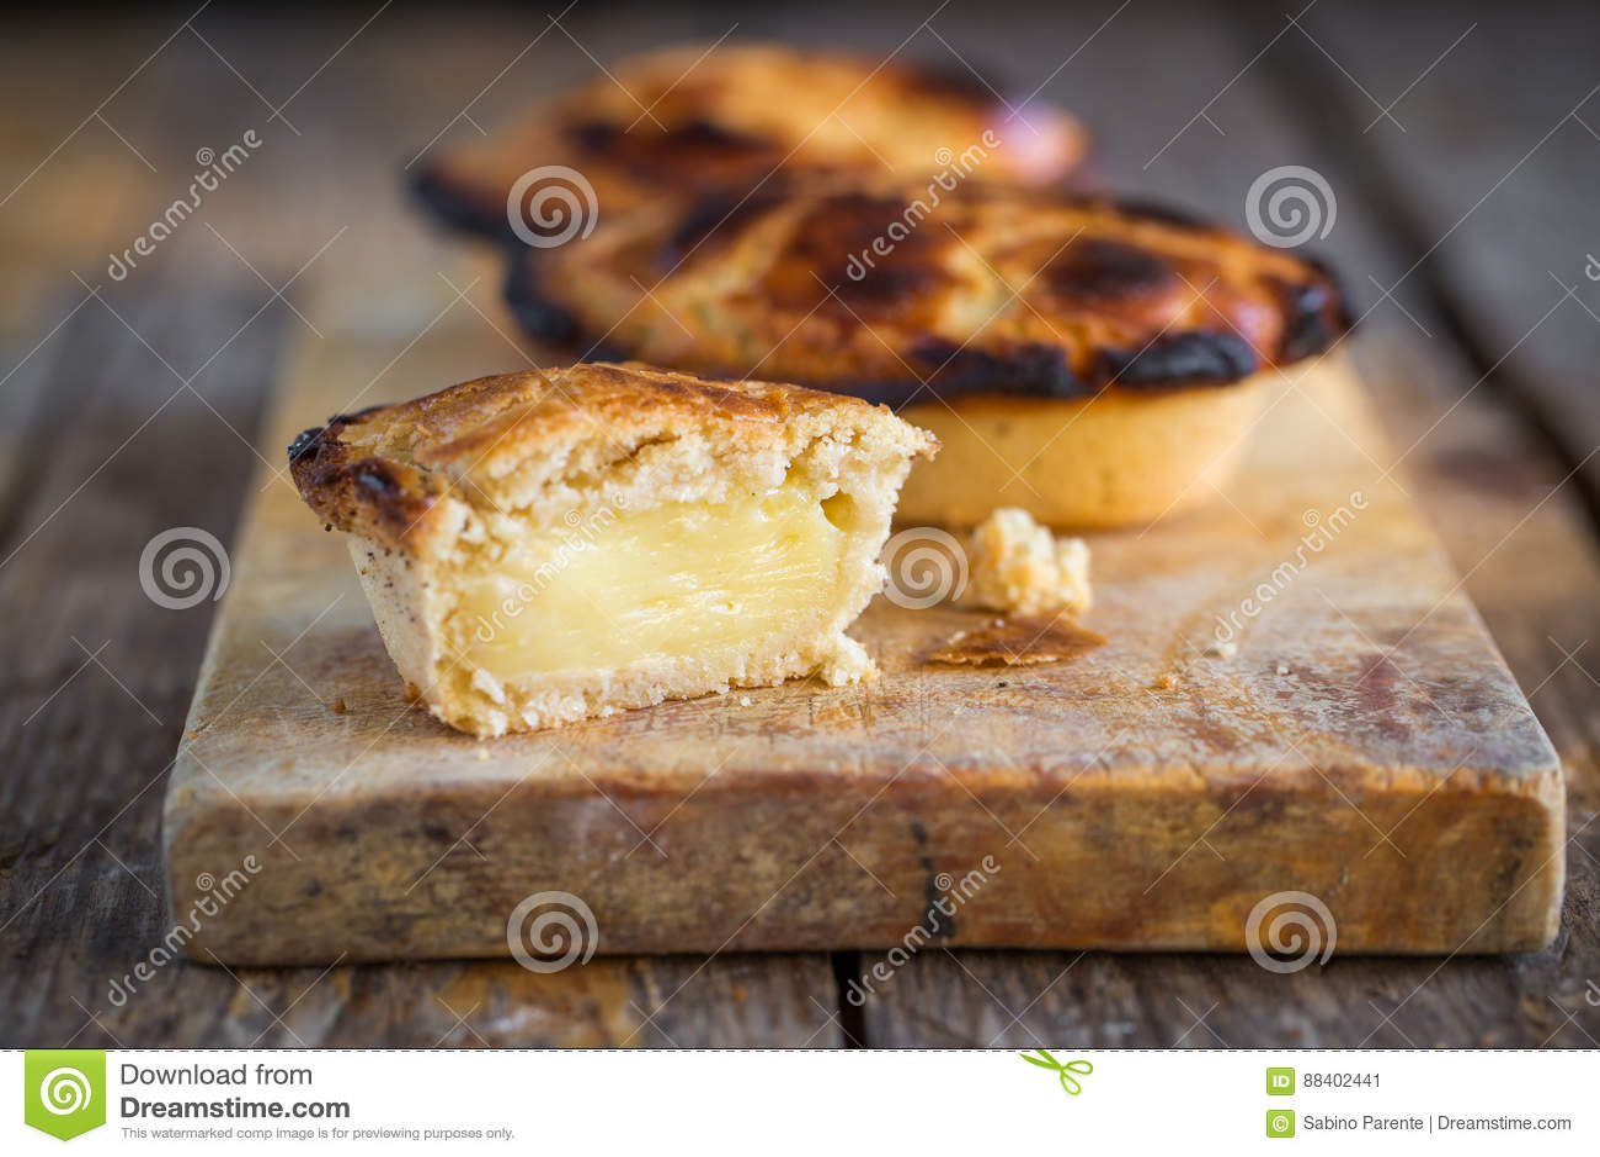 Pasticciotto leccese bakelse